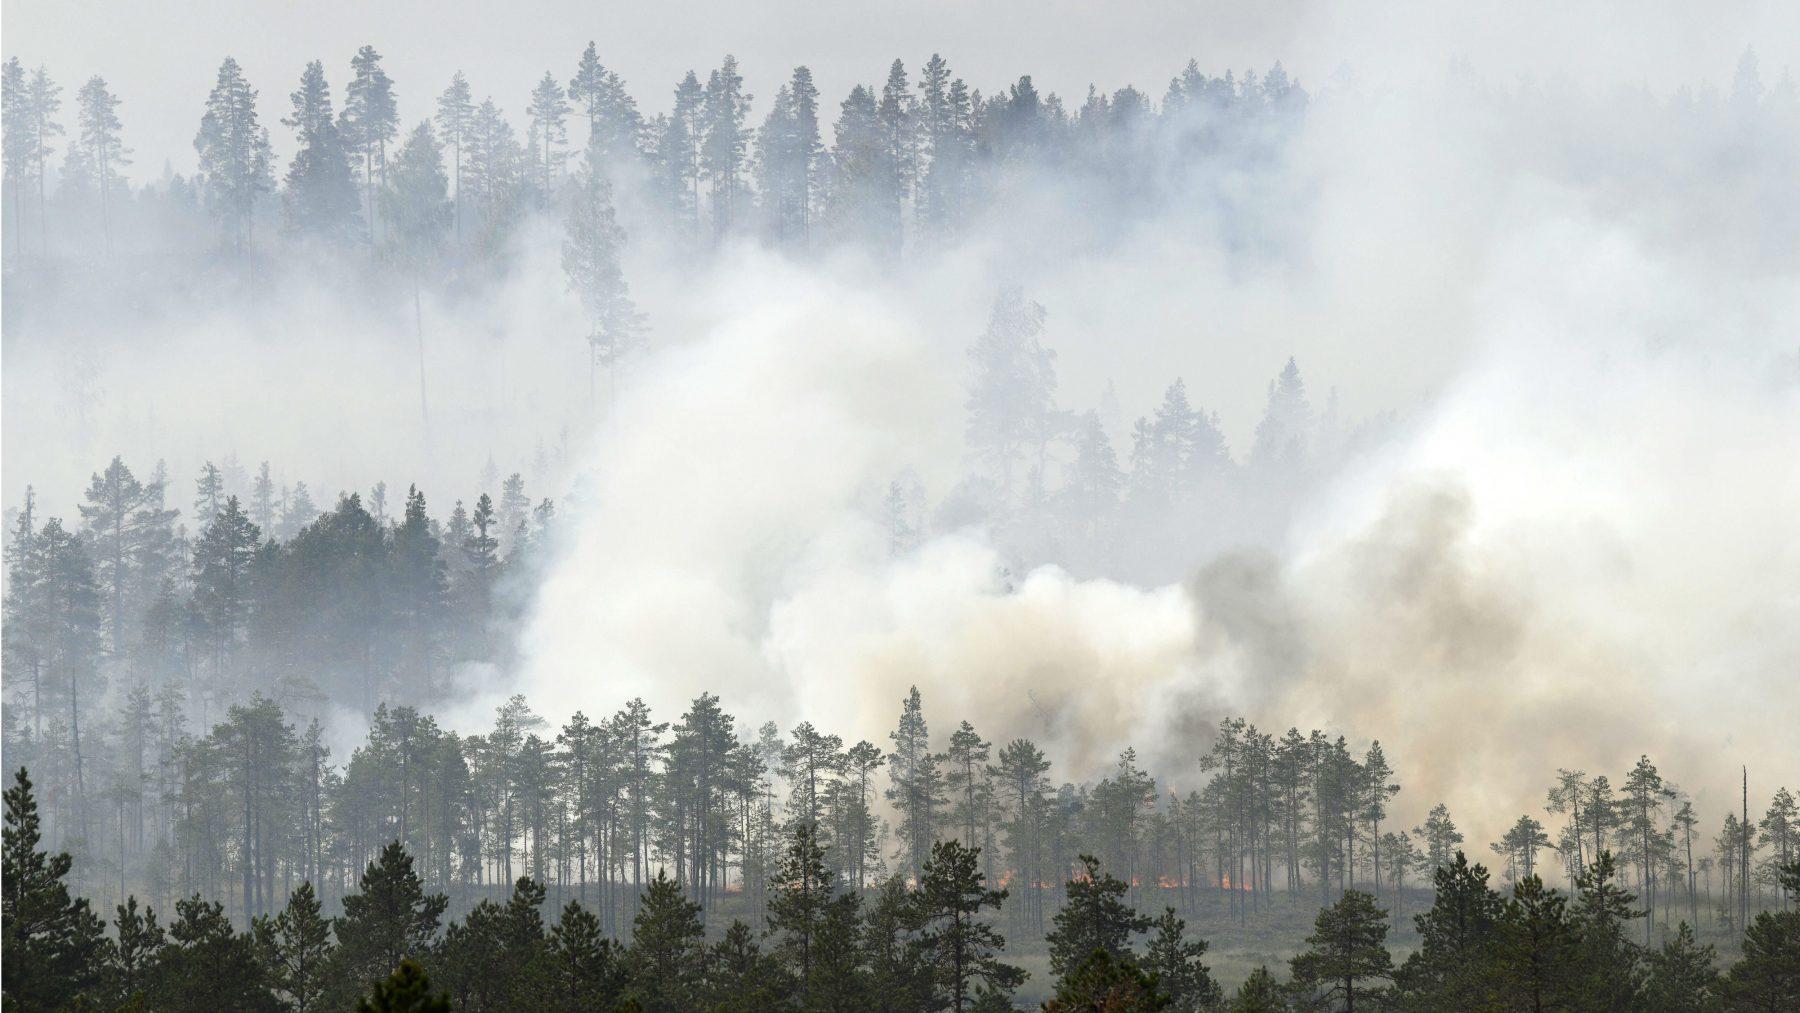 Swedish municipalities to cooperate in fighting future wildfires